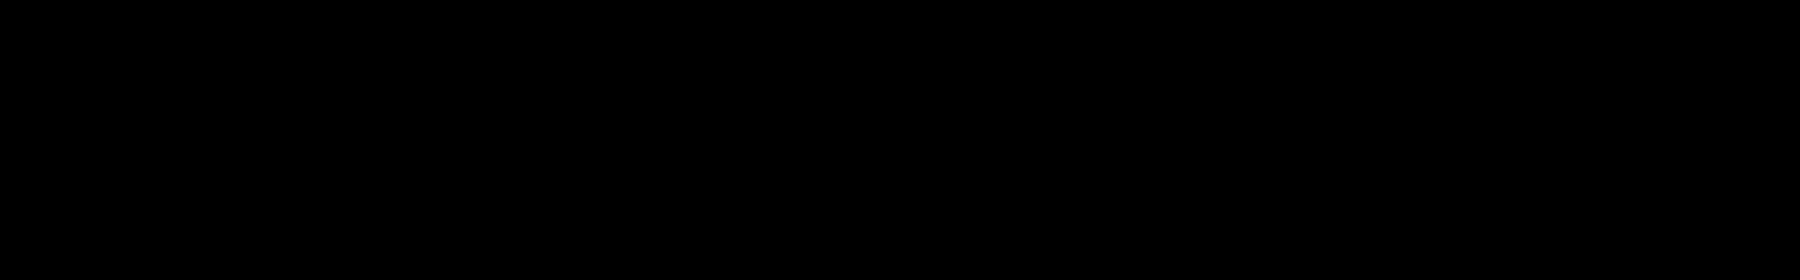 DAGGER audio waveform